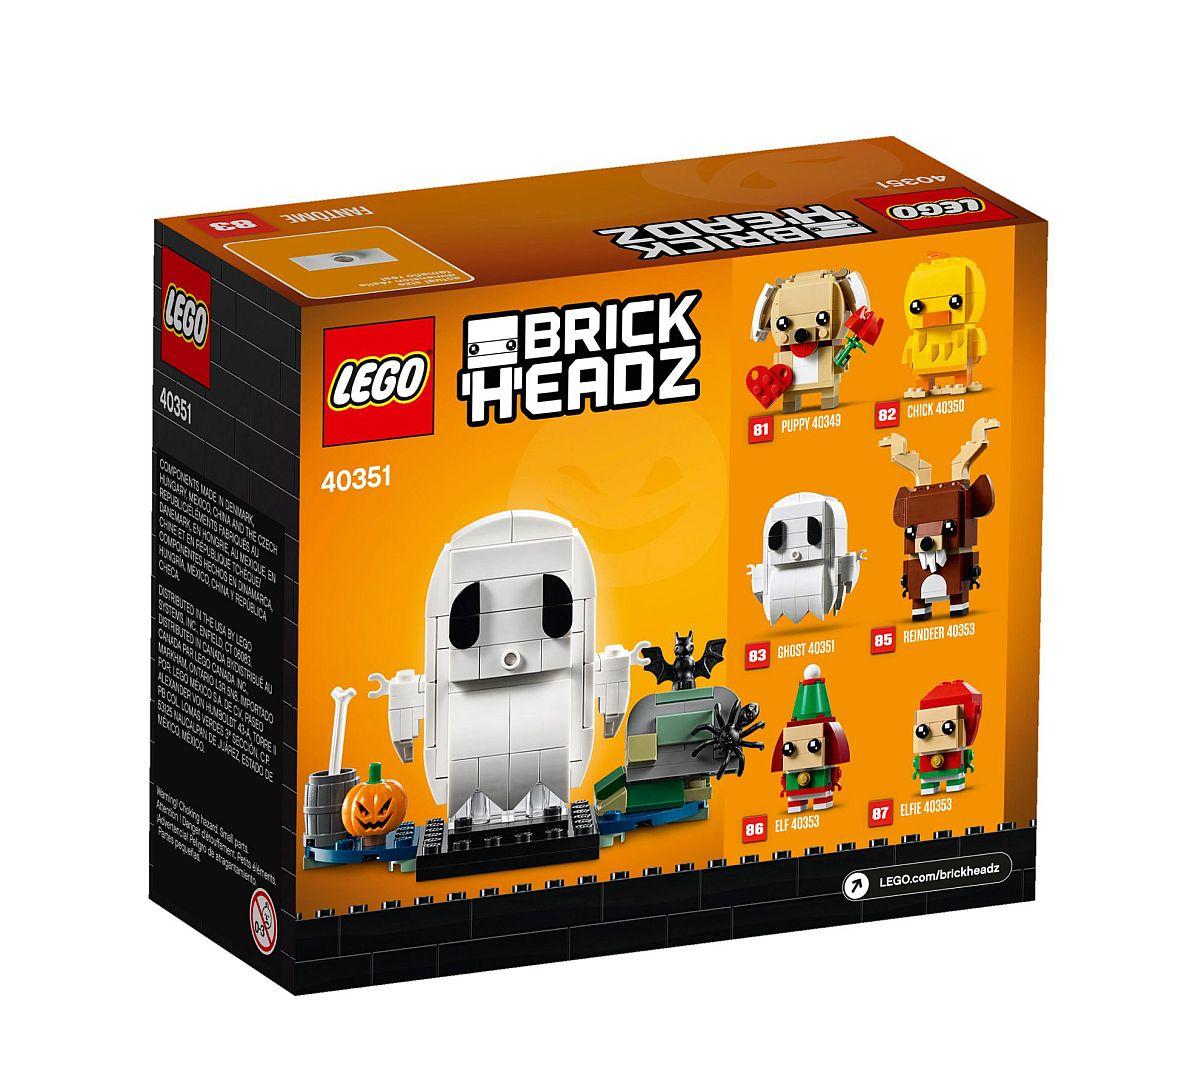 lego-brickheadz-40351-ghost-003